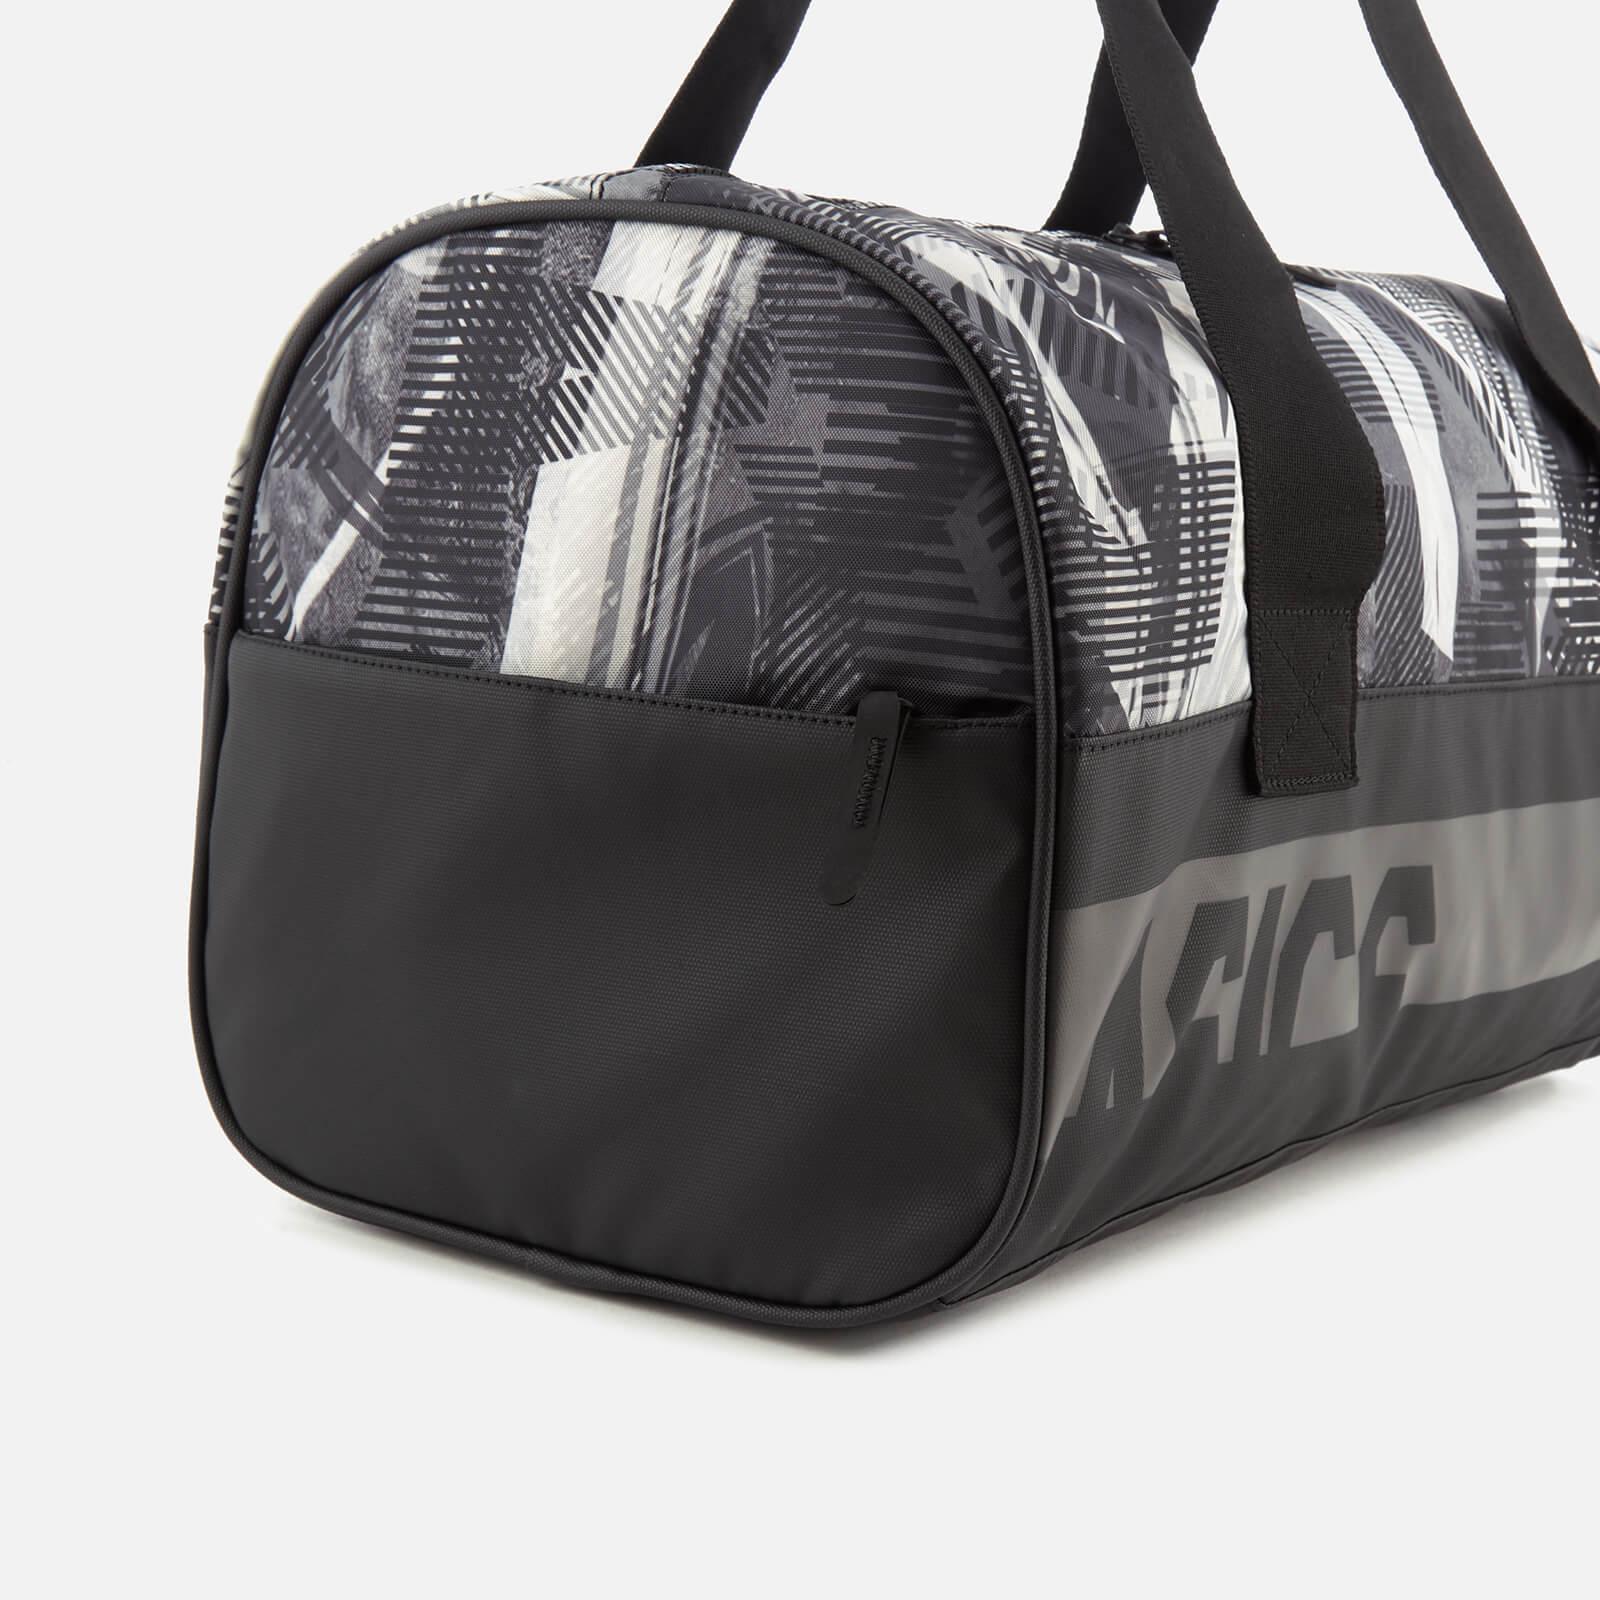 6b0b670aa1 Asics Training Gym Bag in Black for Men - Lyst